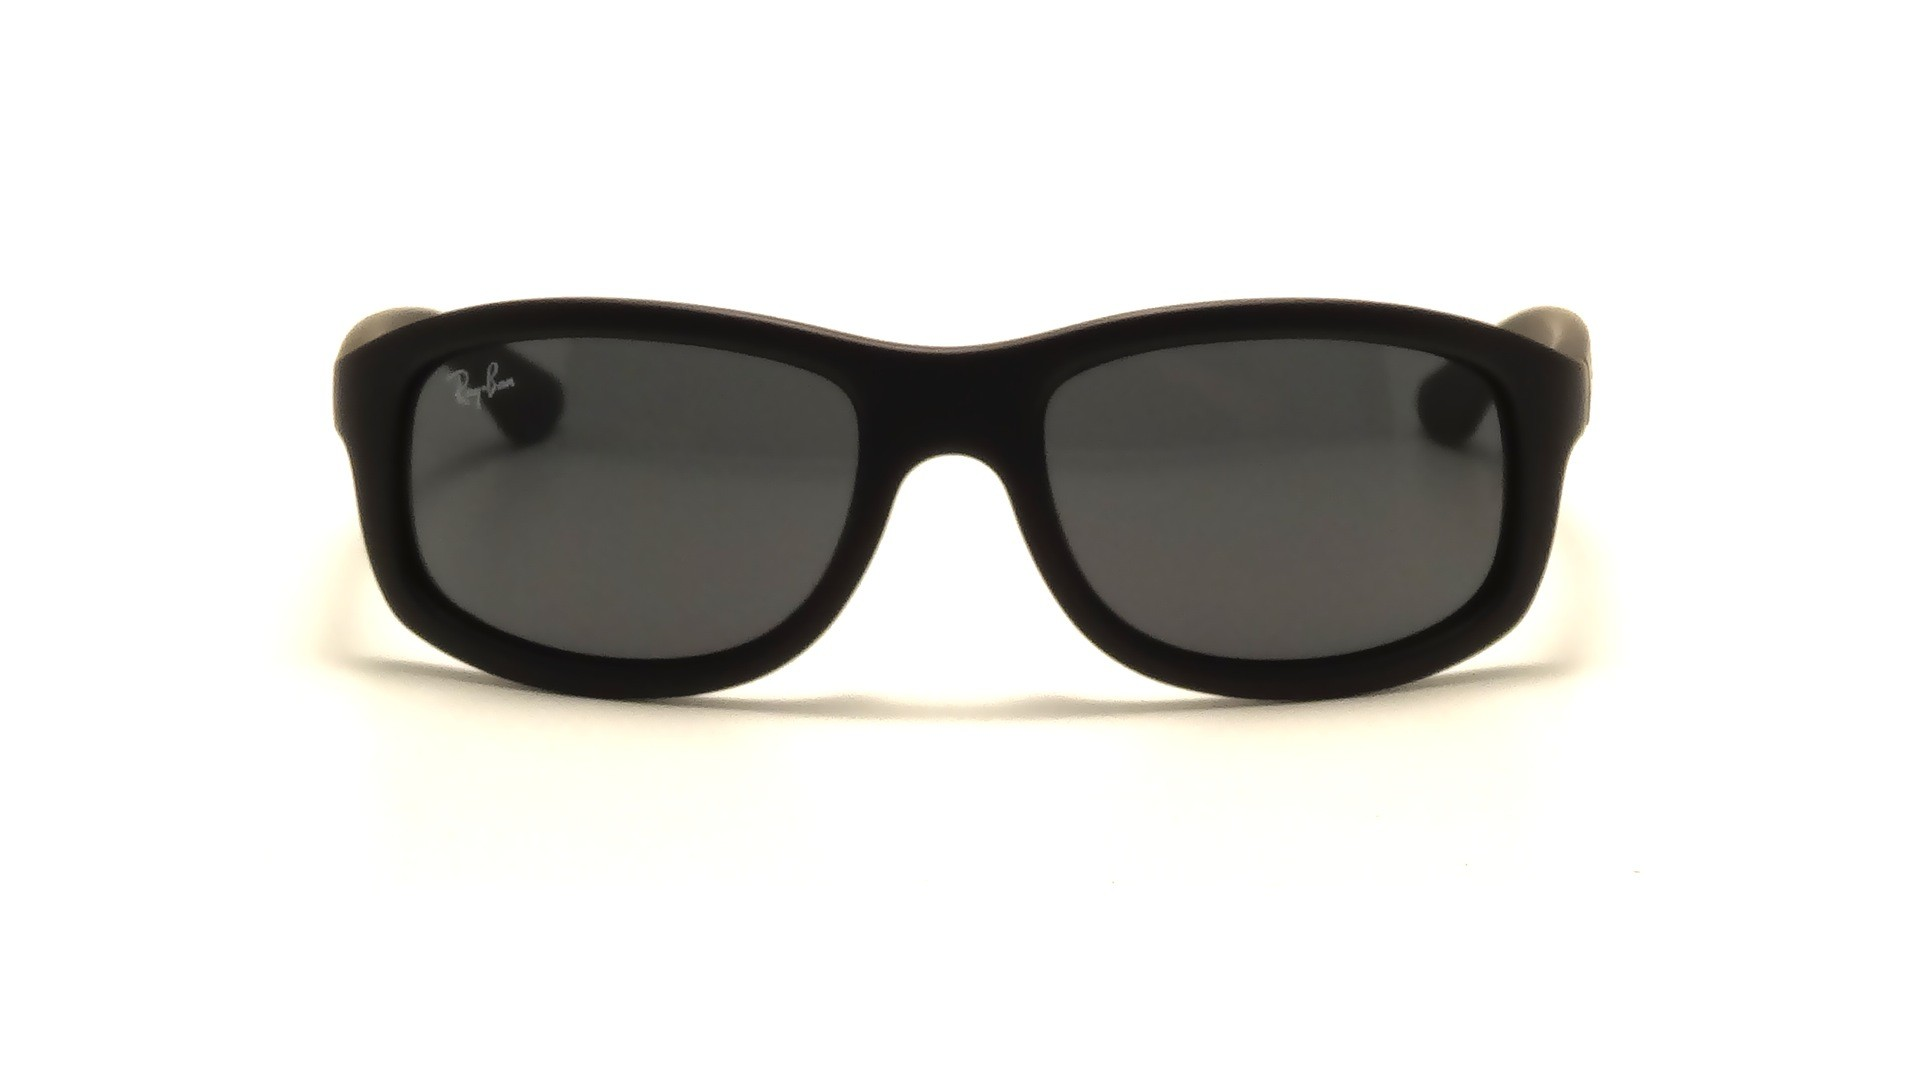 614c4dc52d Sunglasses Ray-Ban RJ9058S 7001 87 50-15 Black Junior